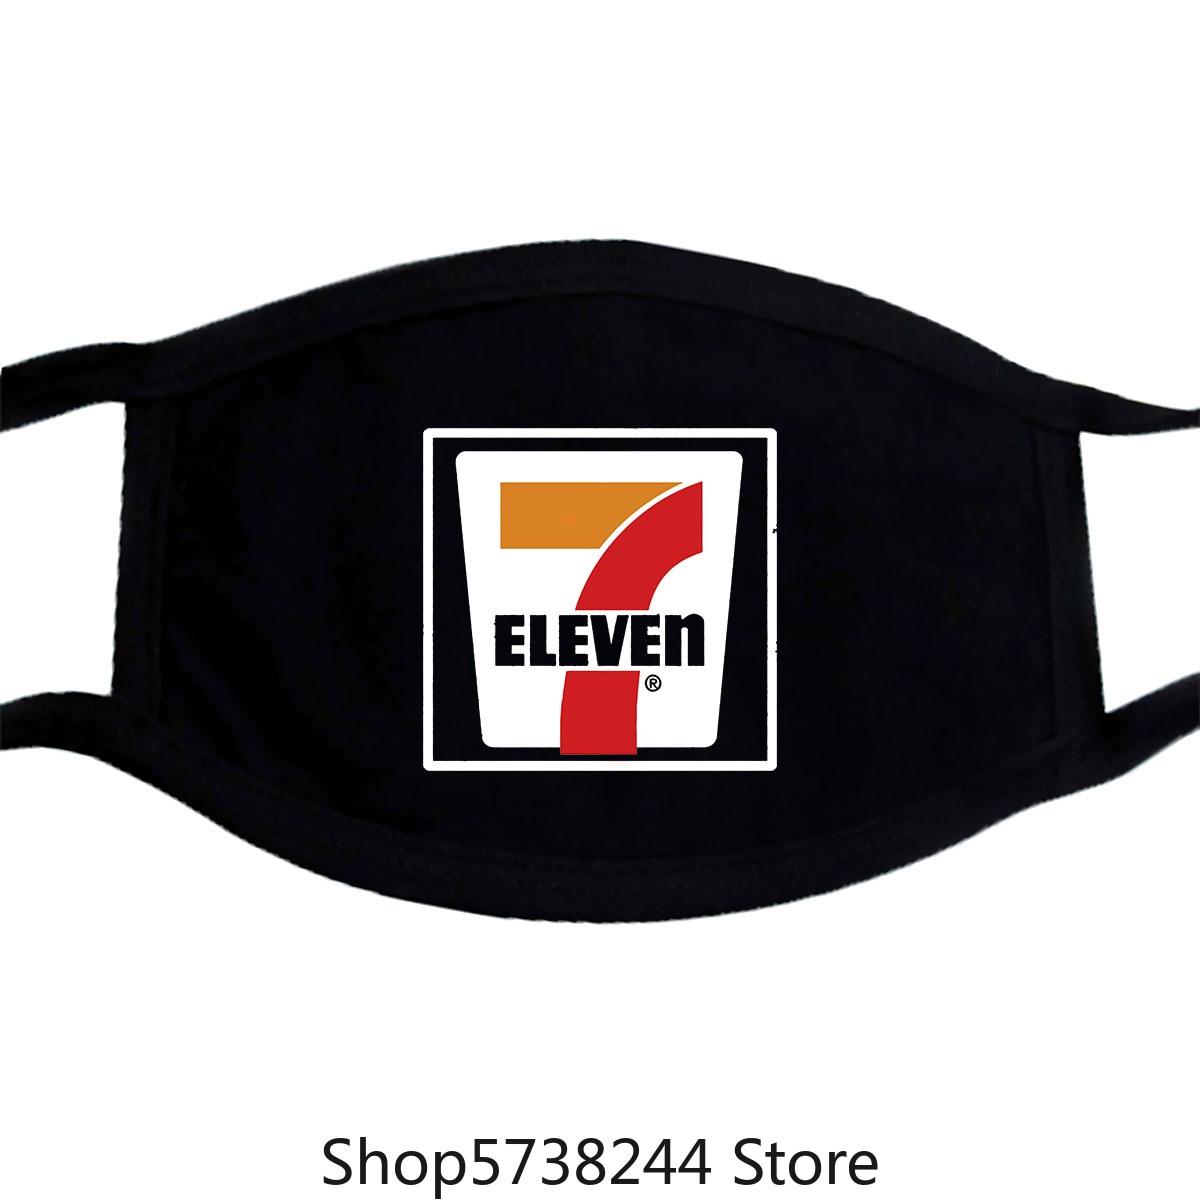 7-11, Seven, Eleven, Retro, Distressed, Logo, Mask Washable Reusable Mask